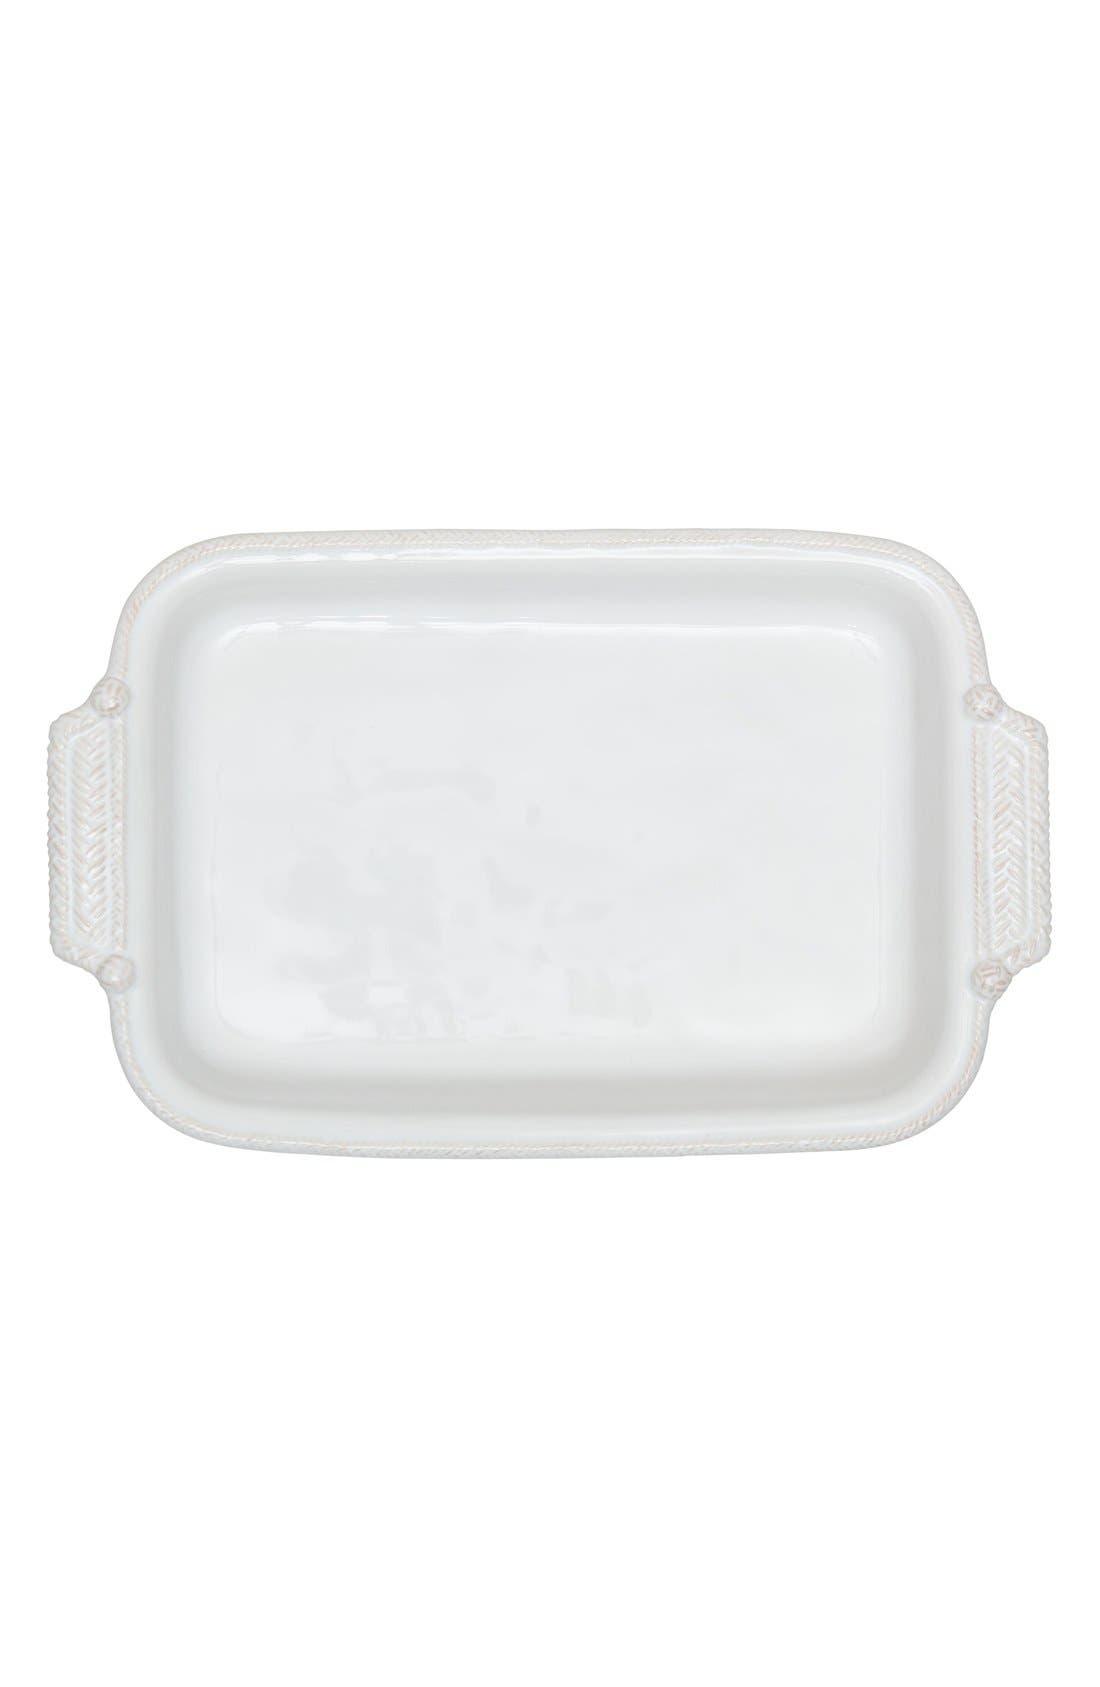 Main Image - Juliska Le Panier 2.5-Quart Rectangular Baking Dish